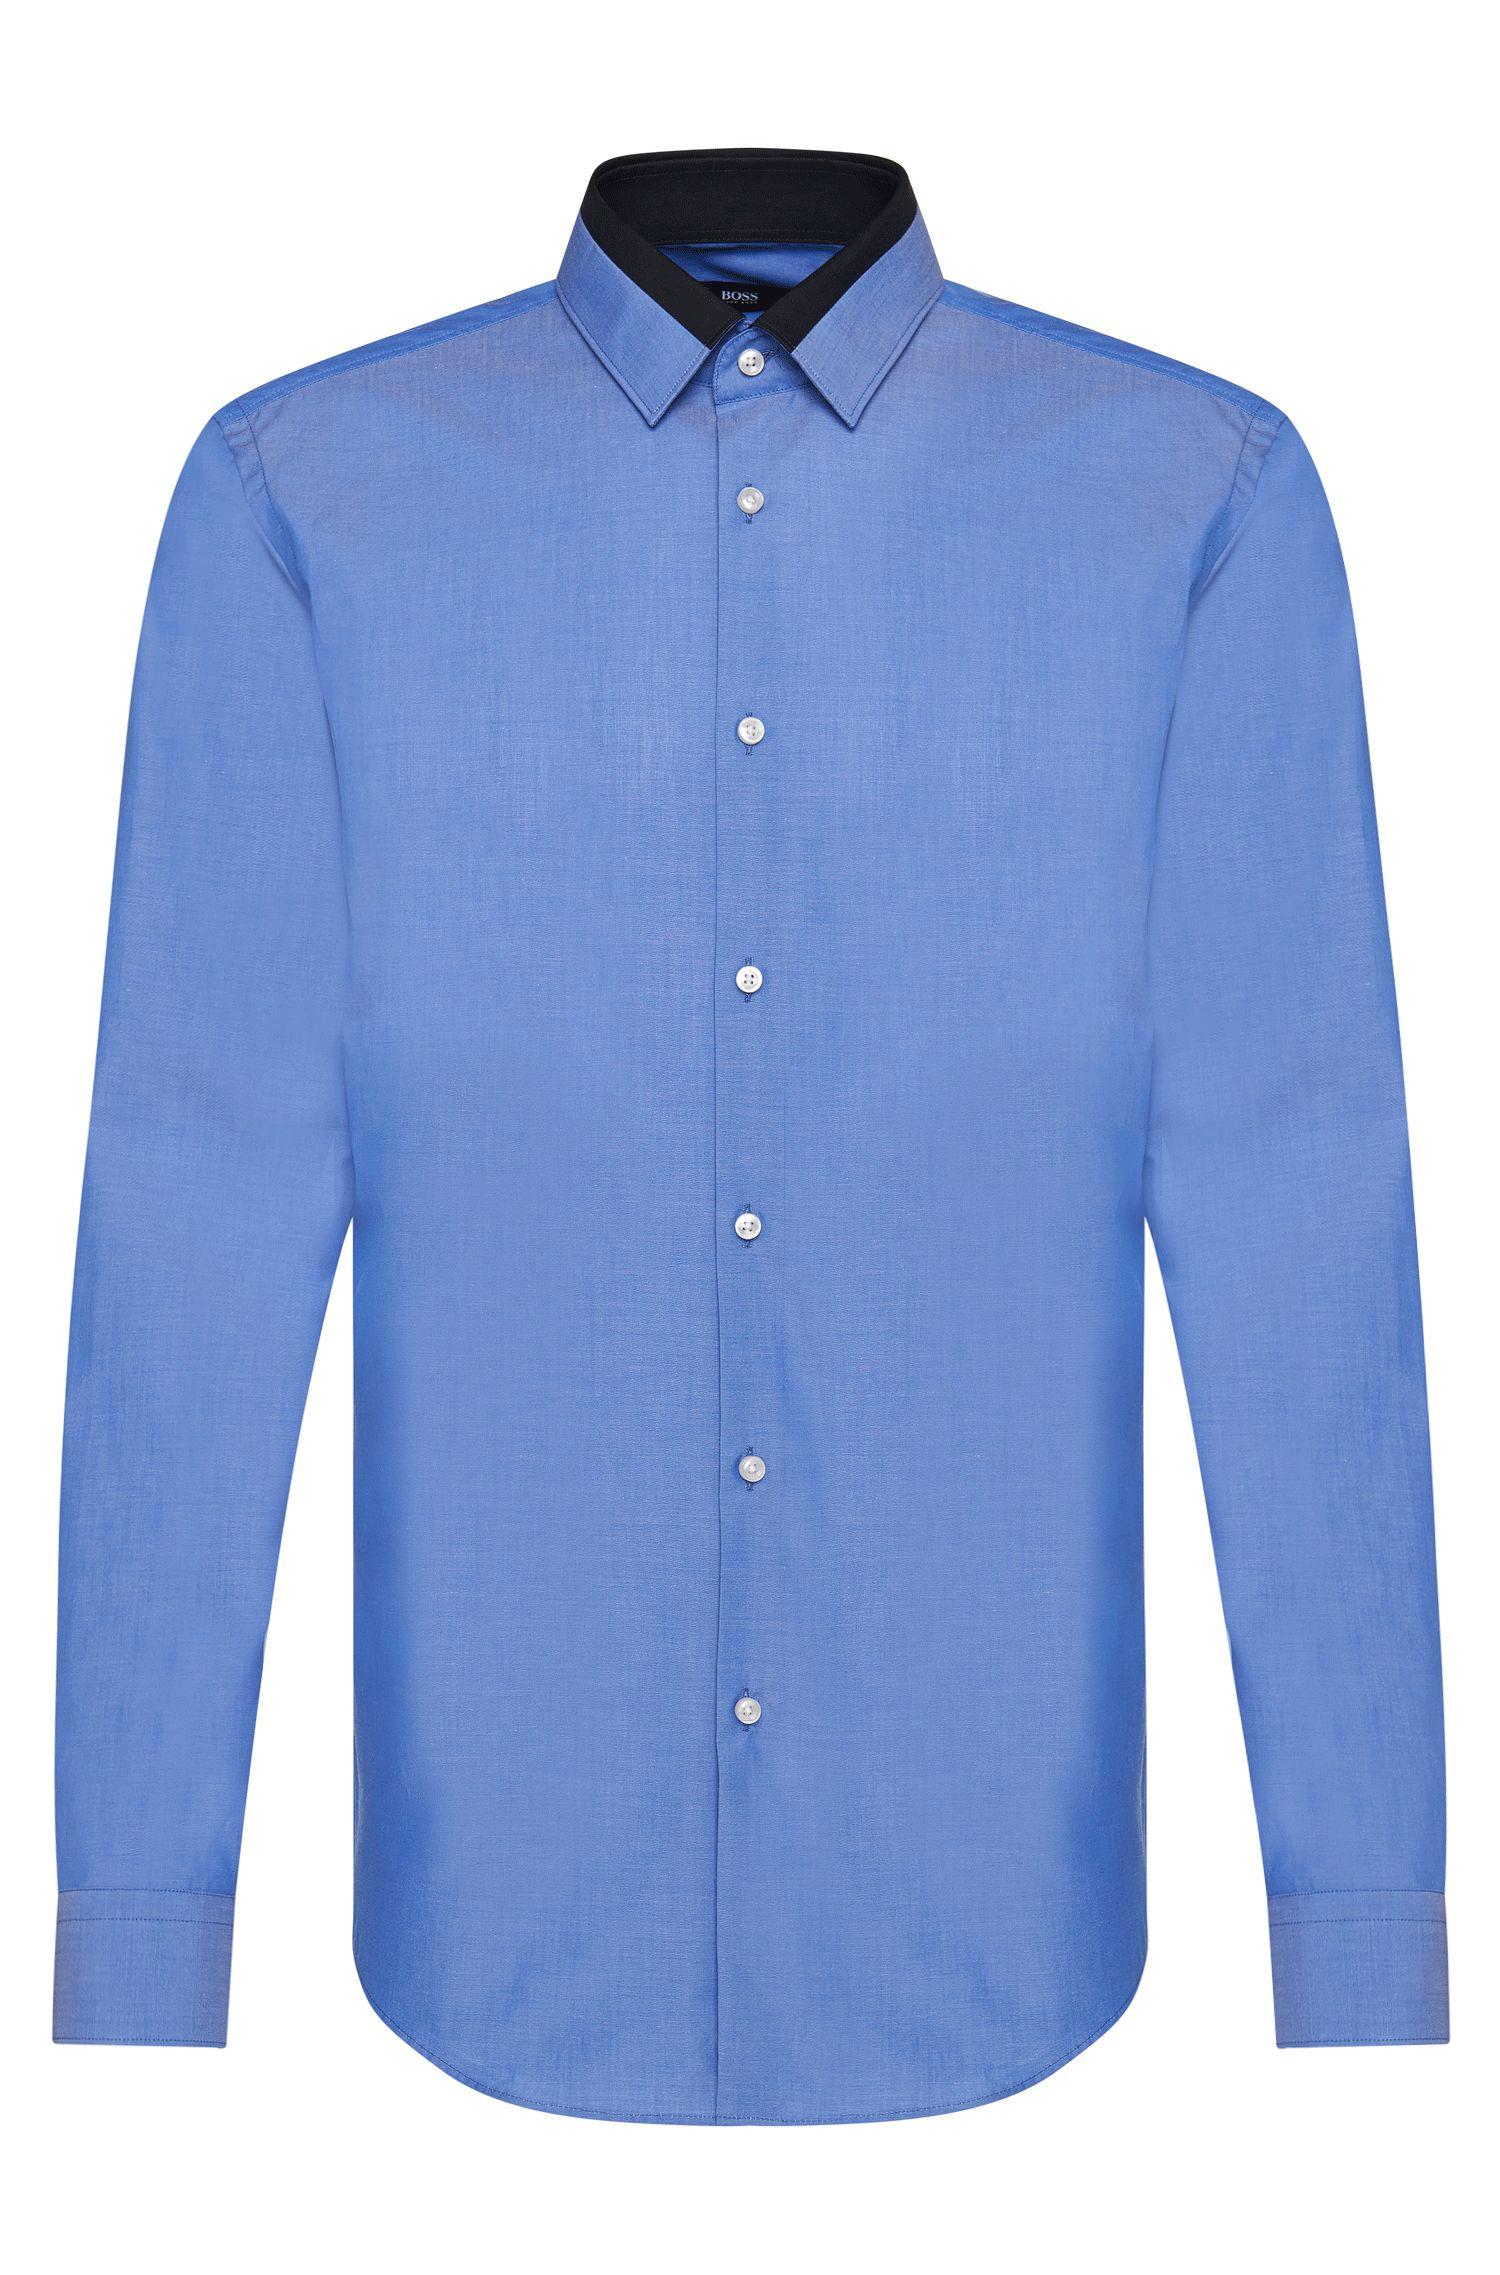 'Jarret' | Slim Fit, Contrast Collar Dress Shirt